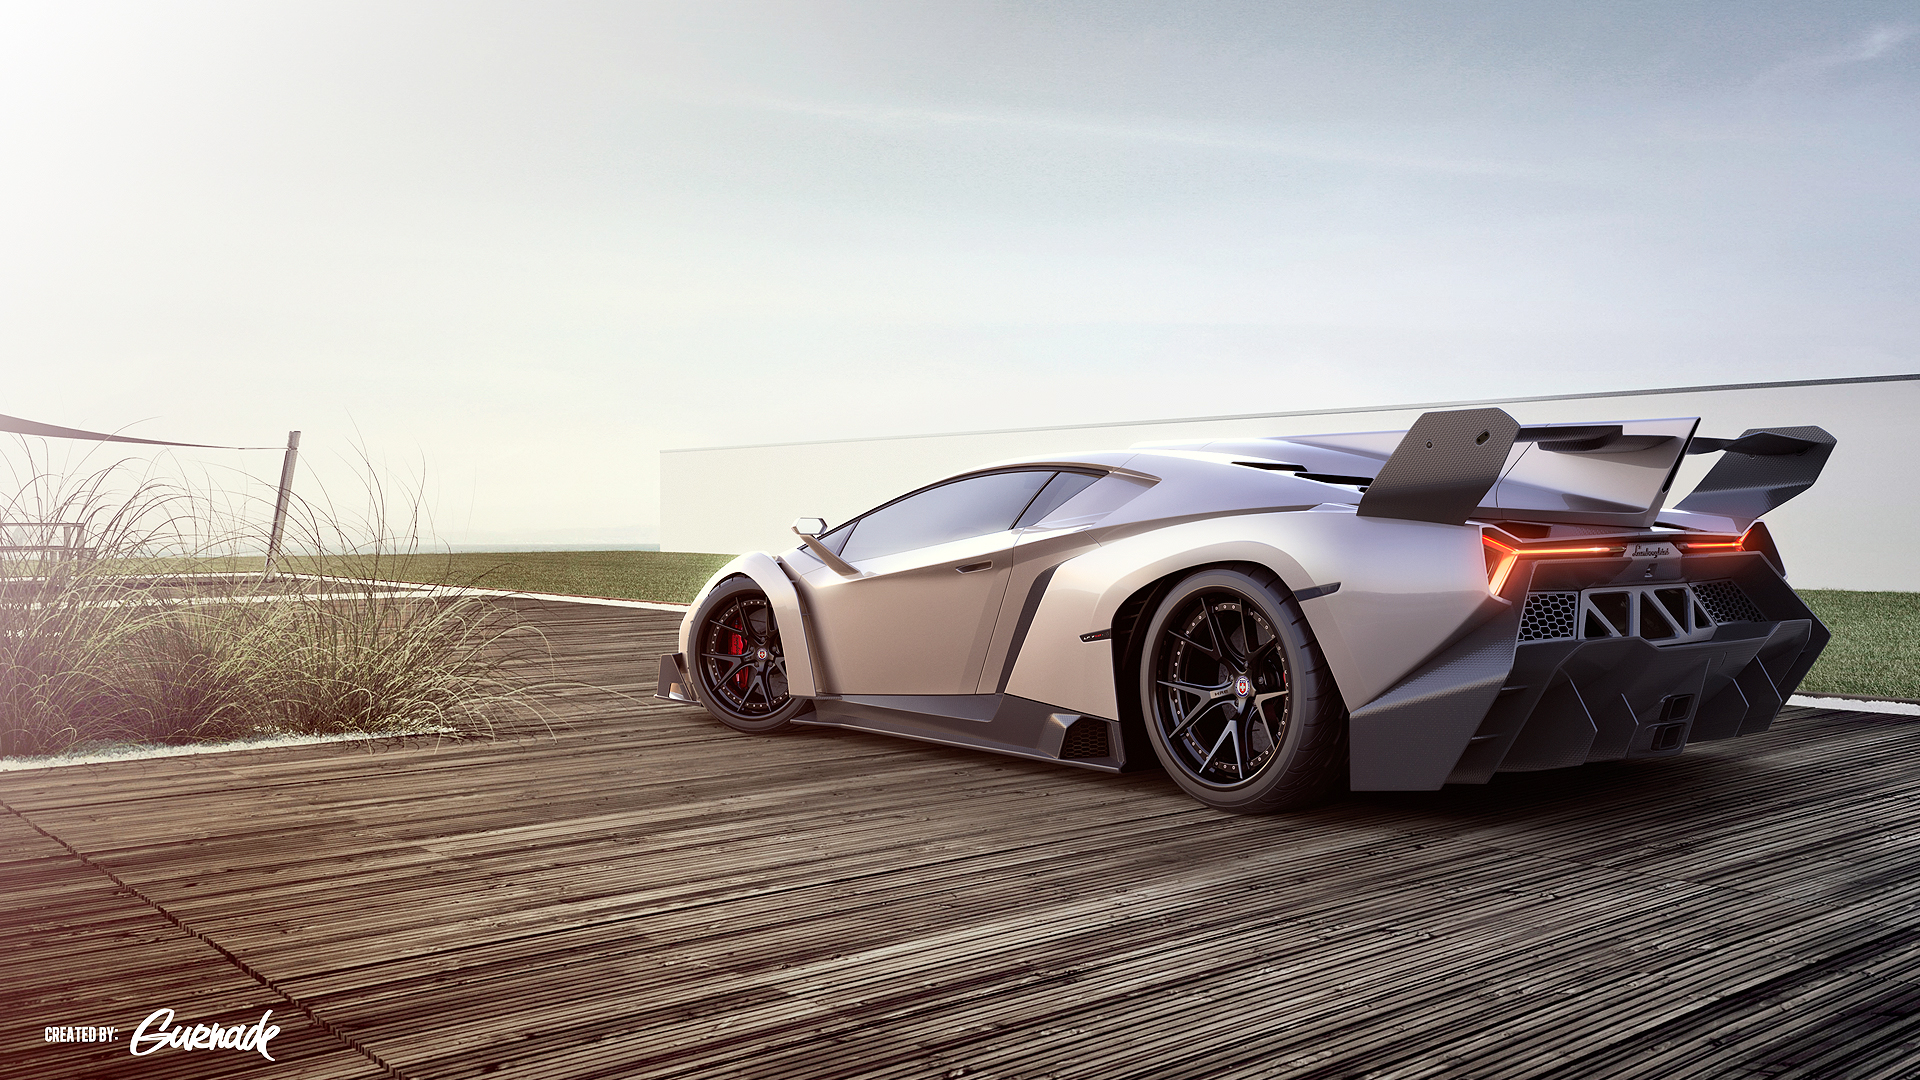 Lamborghini Veneno Sports Car Exclusive HD Wallpapers 5562 1920x1080